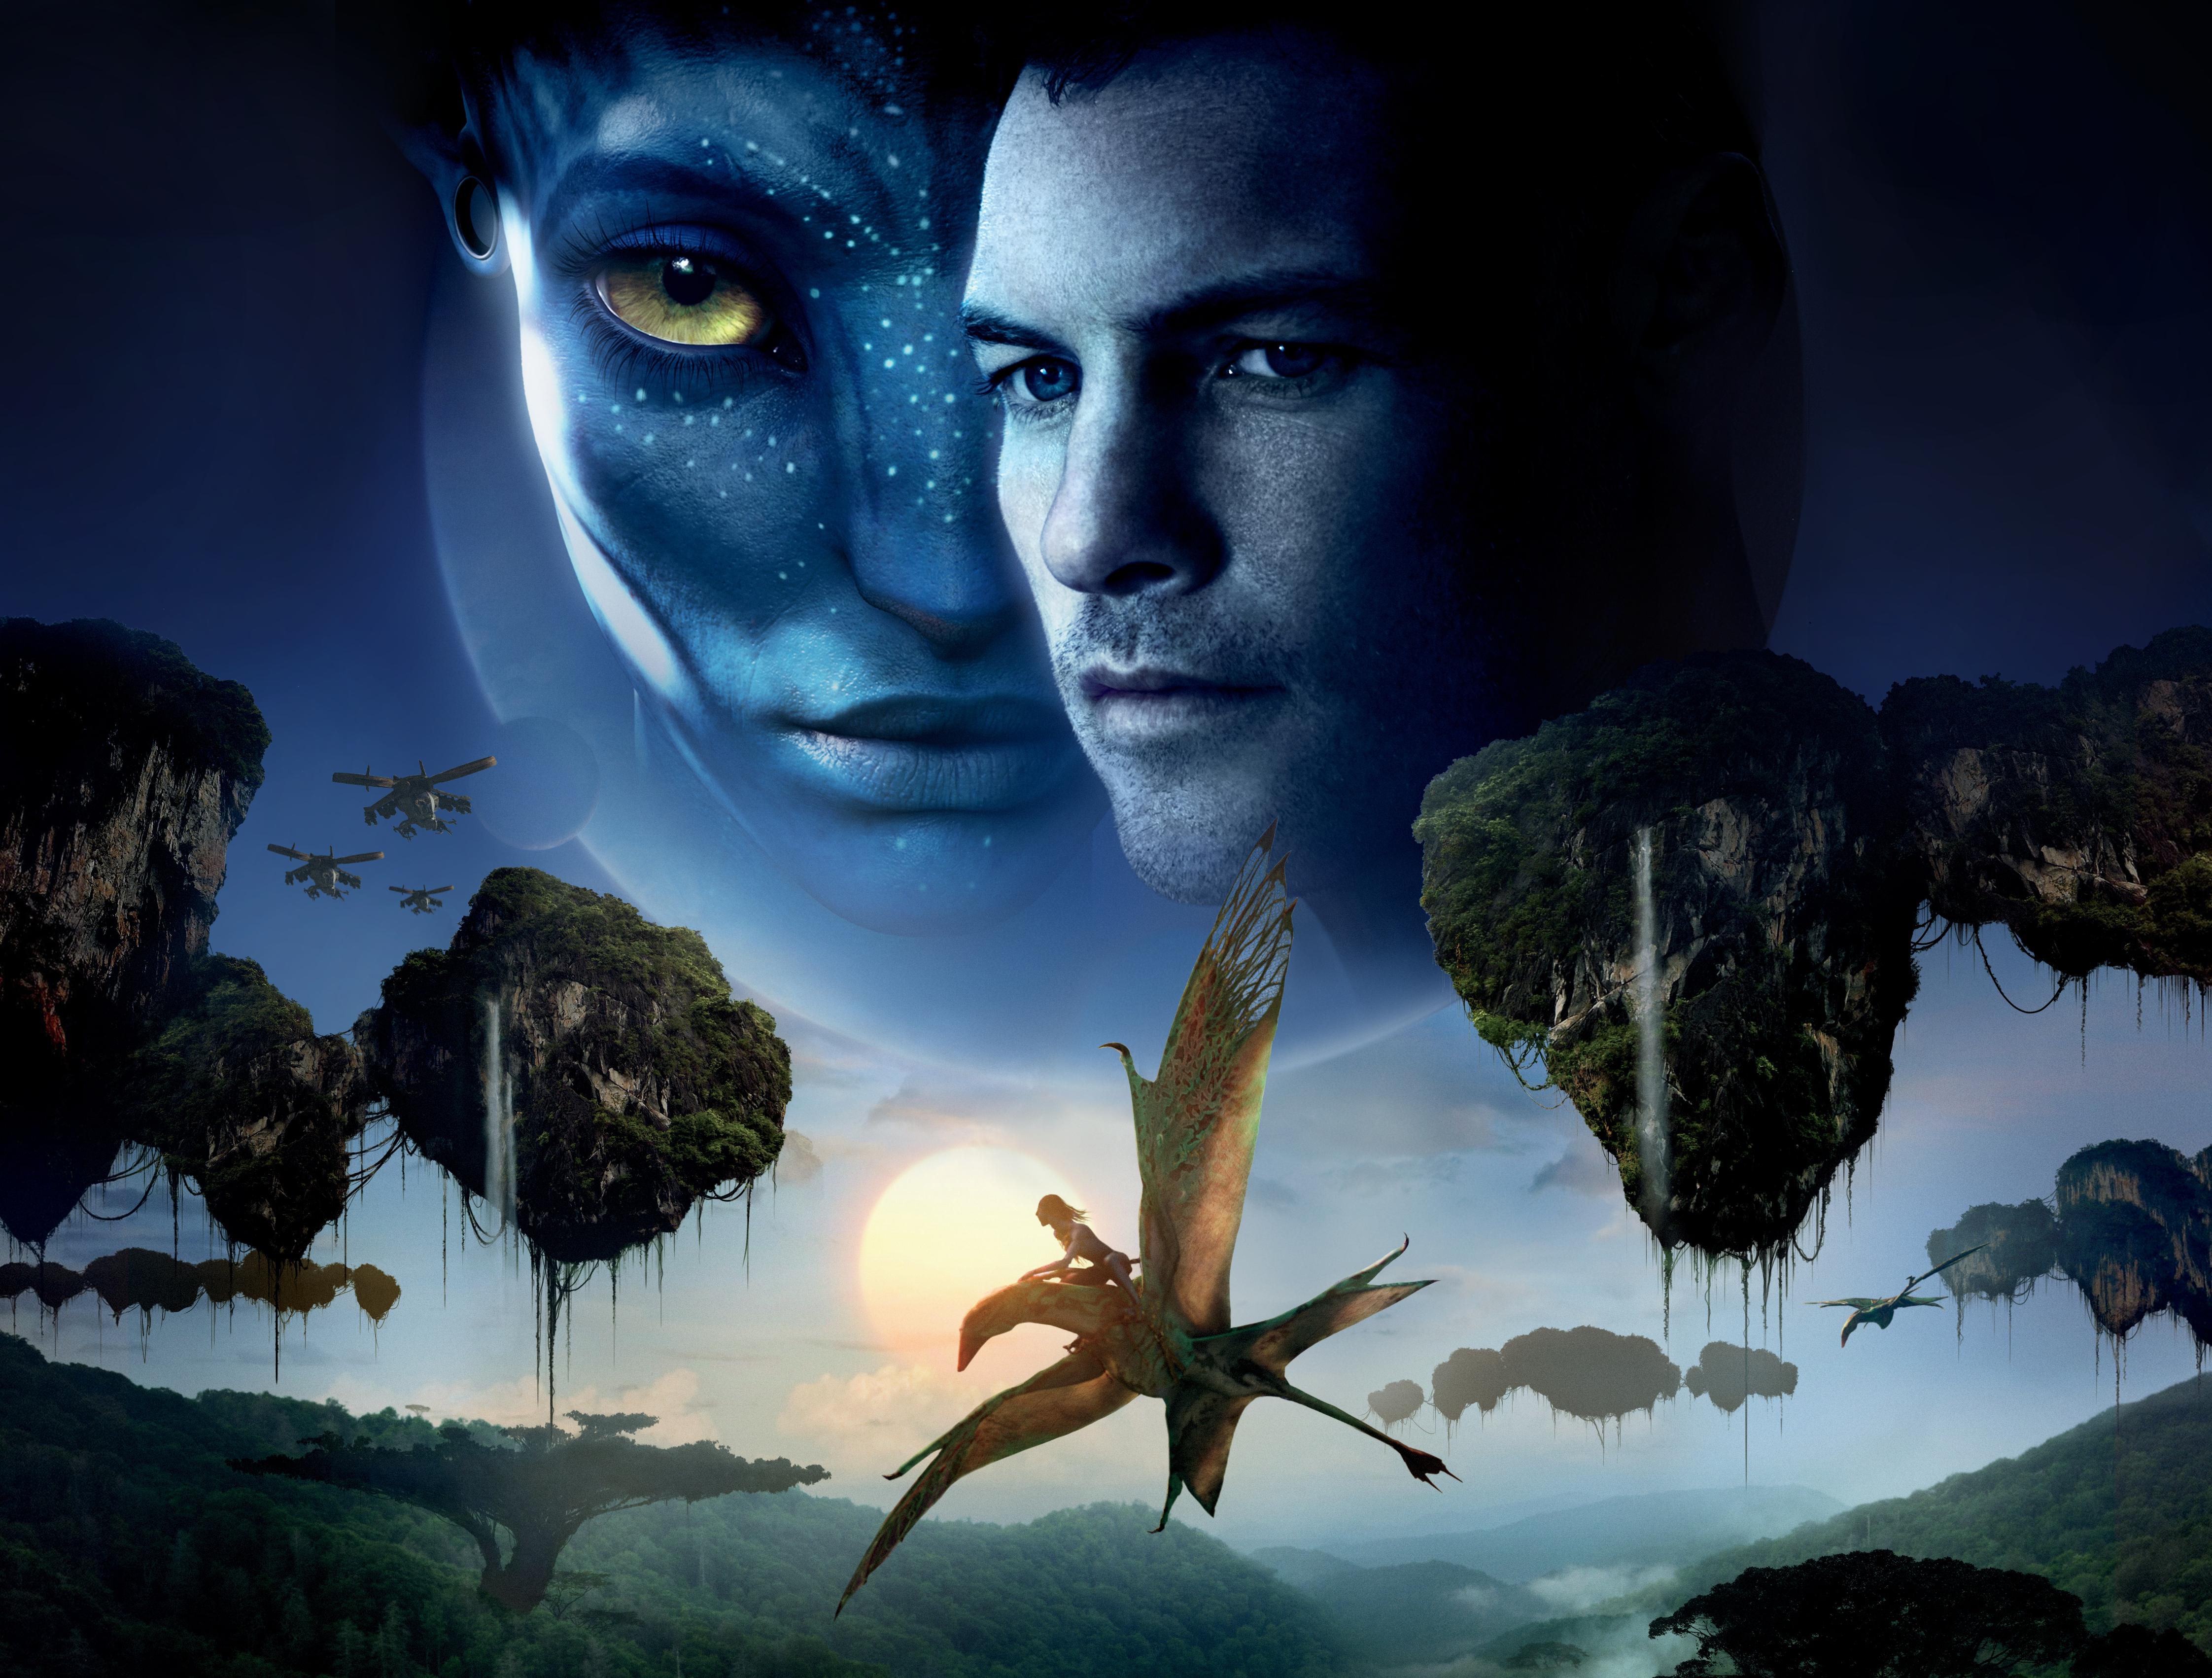 Avatar Sam Worthington Zoe Saldana 4488x3404